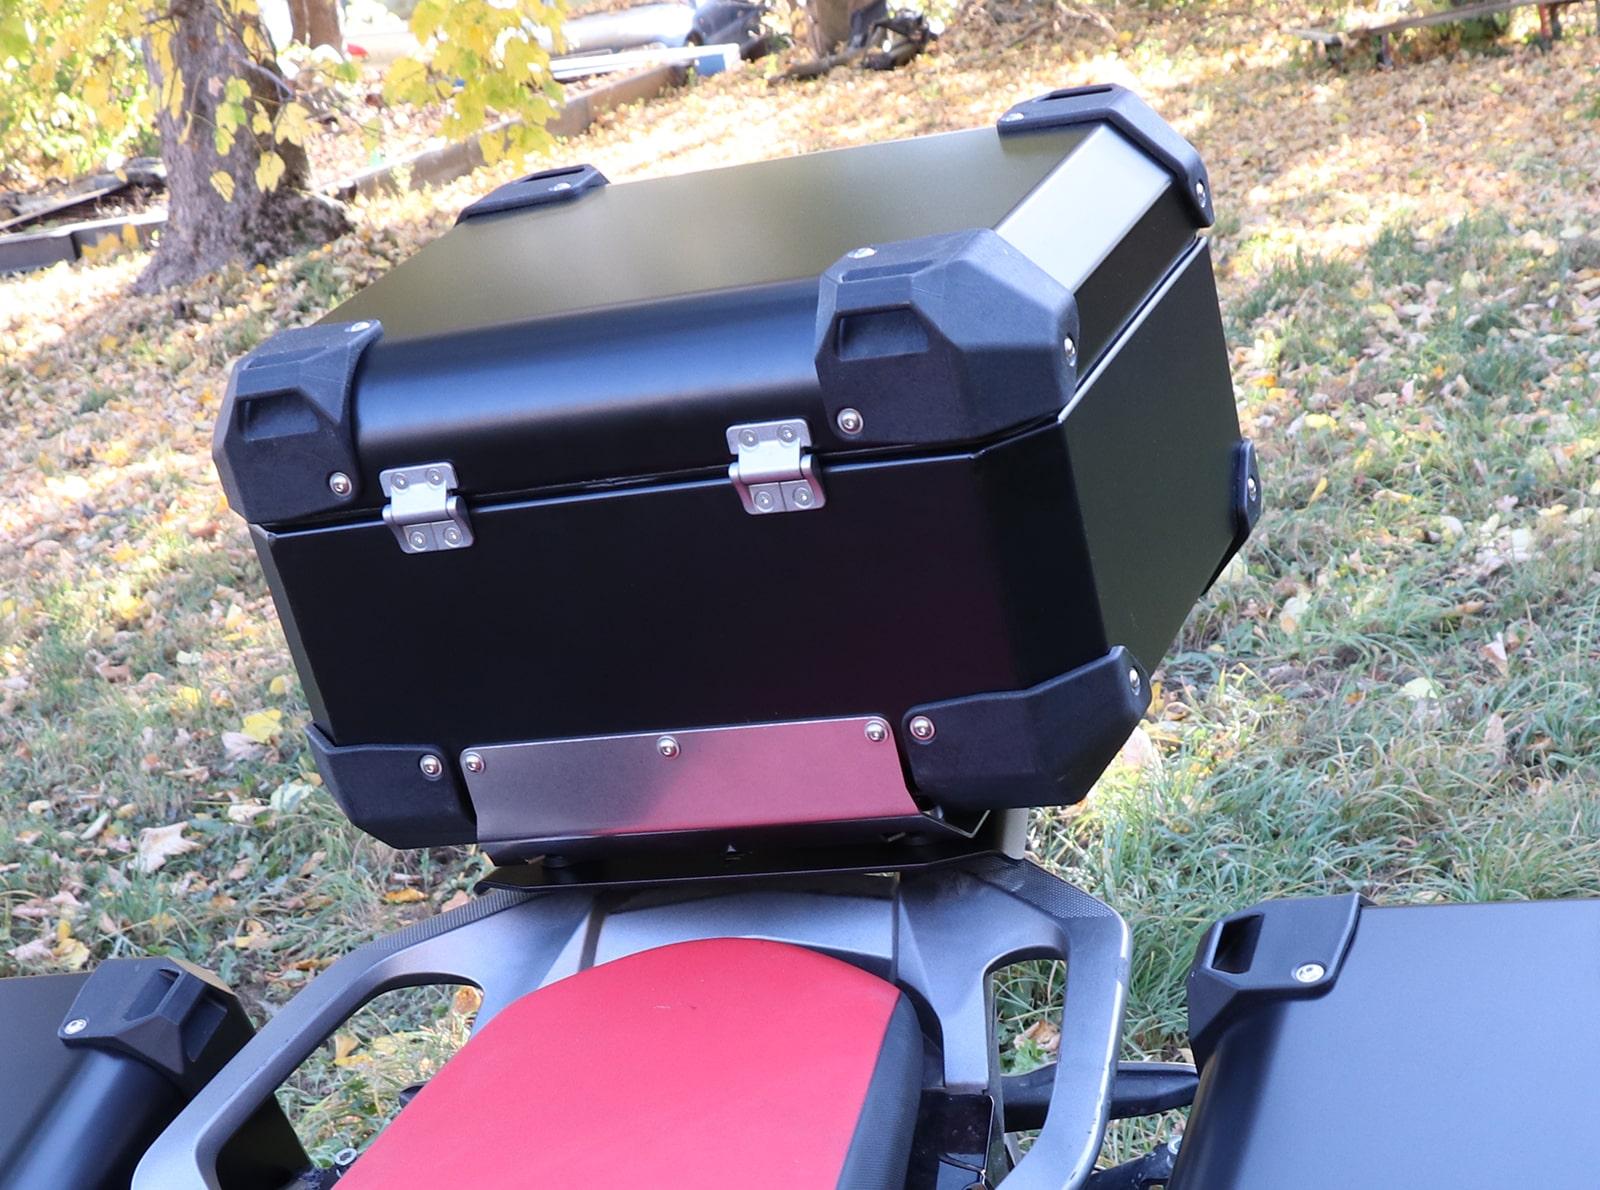 Top case 30L incl. top rack - Standard version